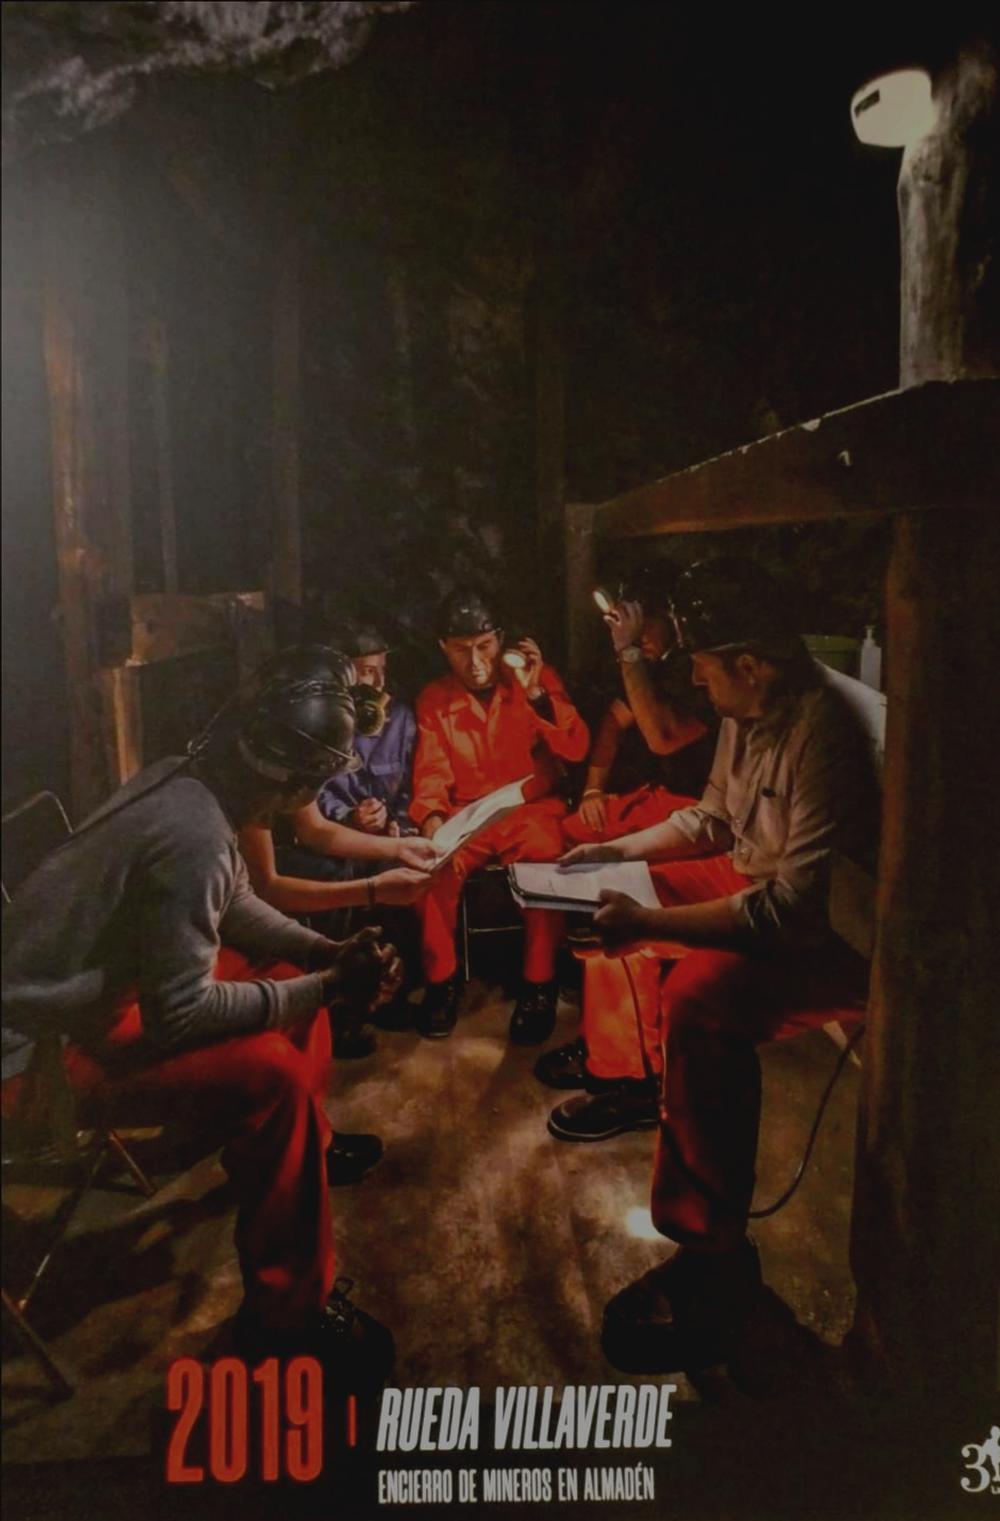 30 años de historia a través del objetivo de 'La Tribuna'